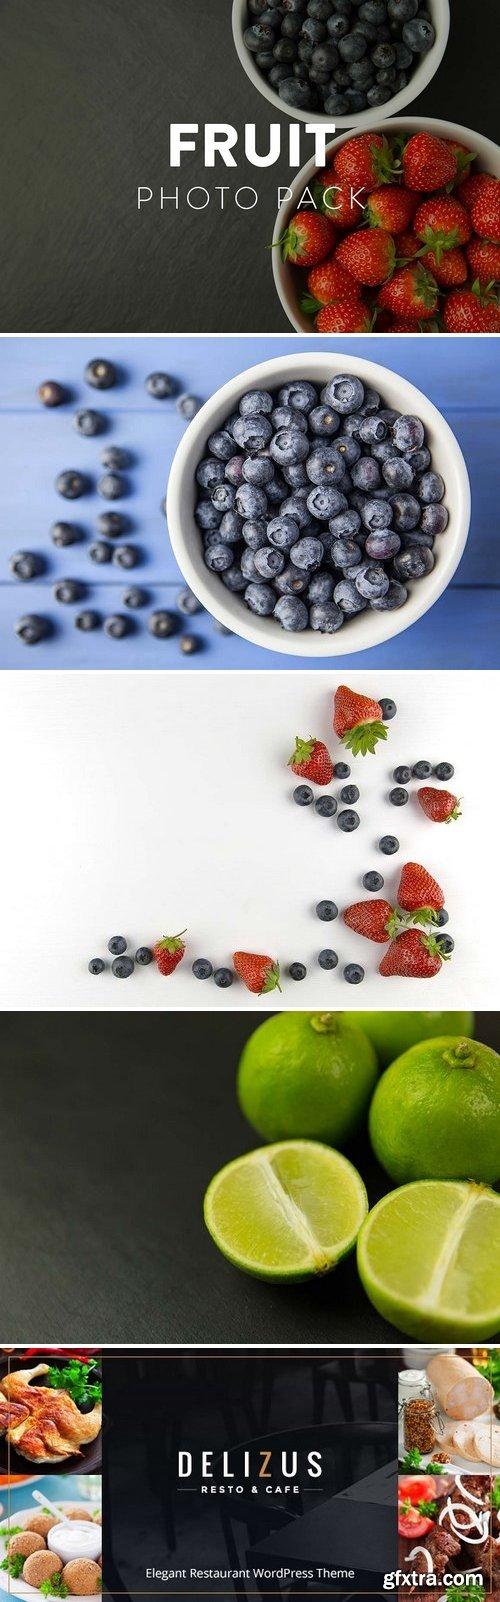 CM - Fruit Photo Pack 567753